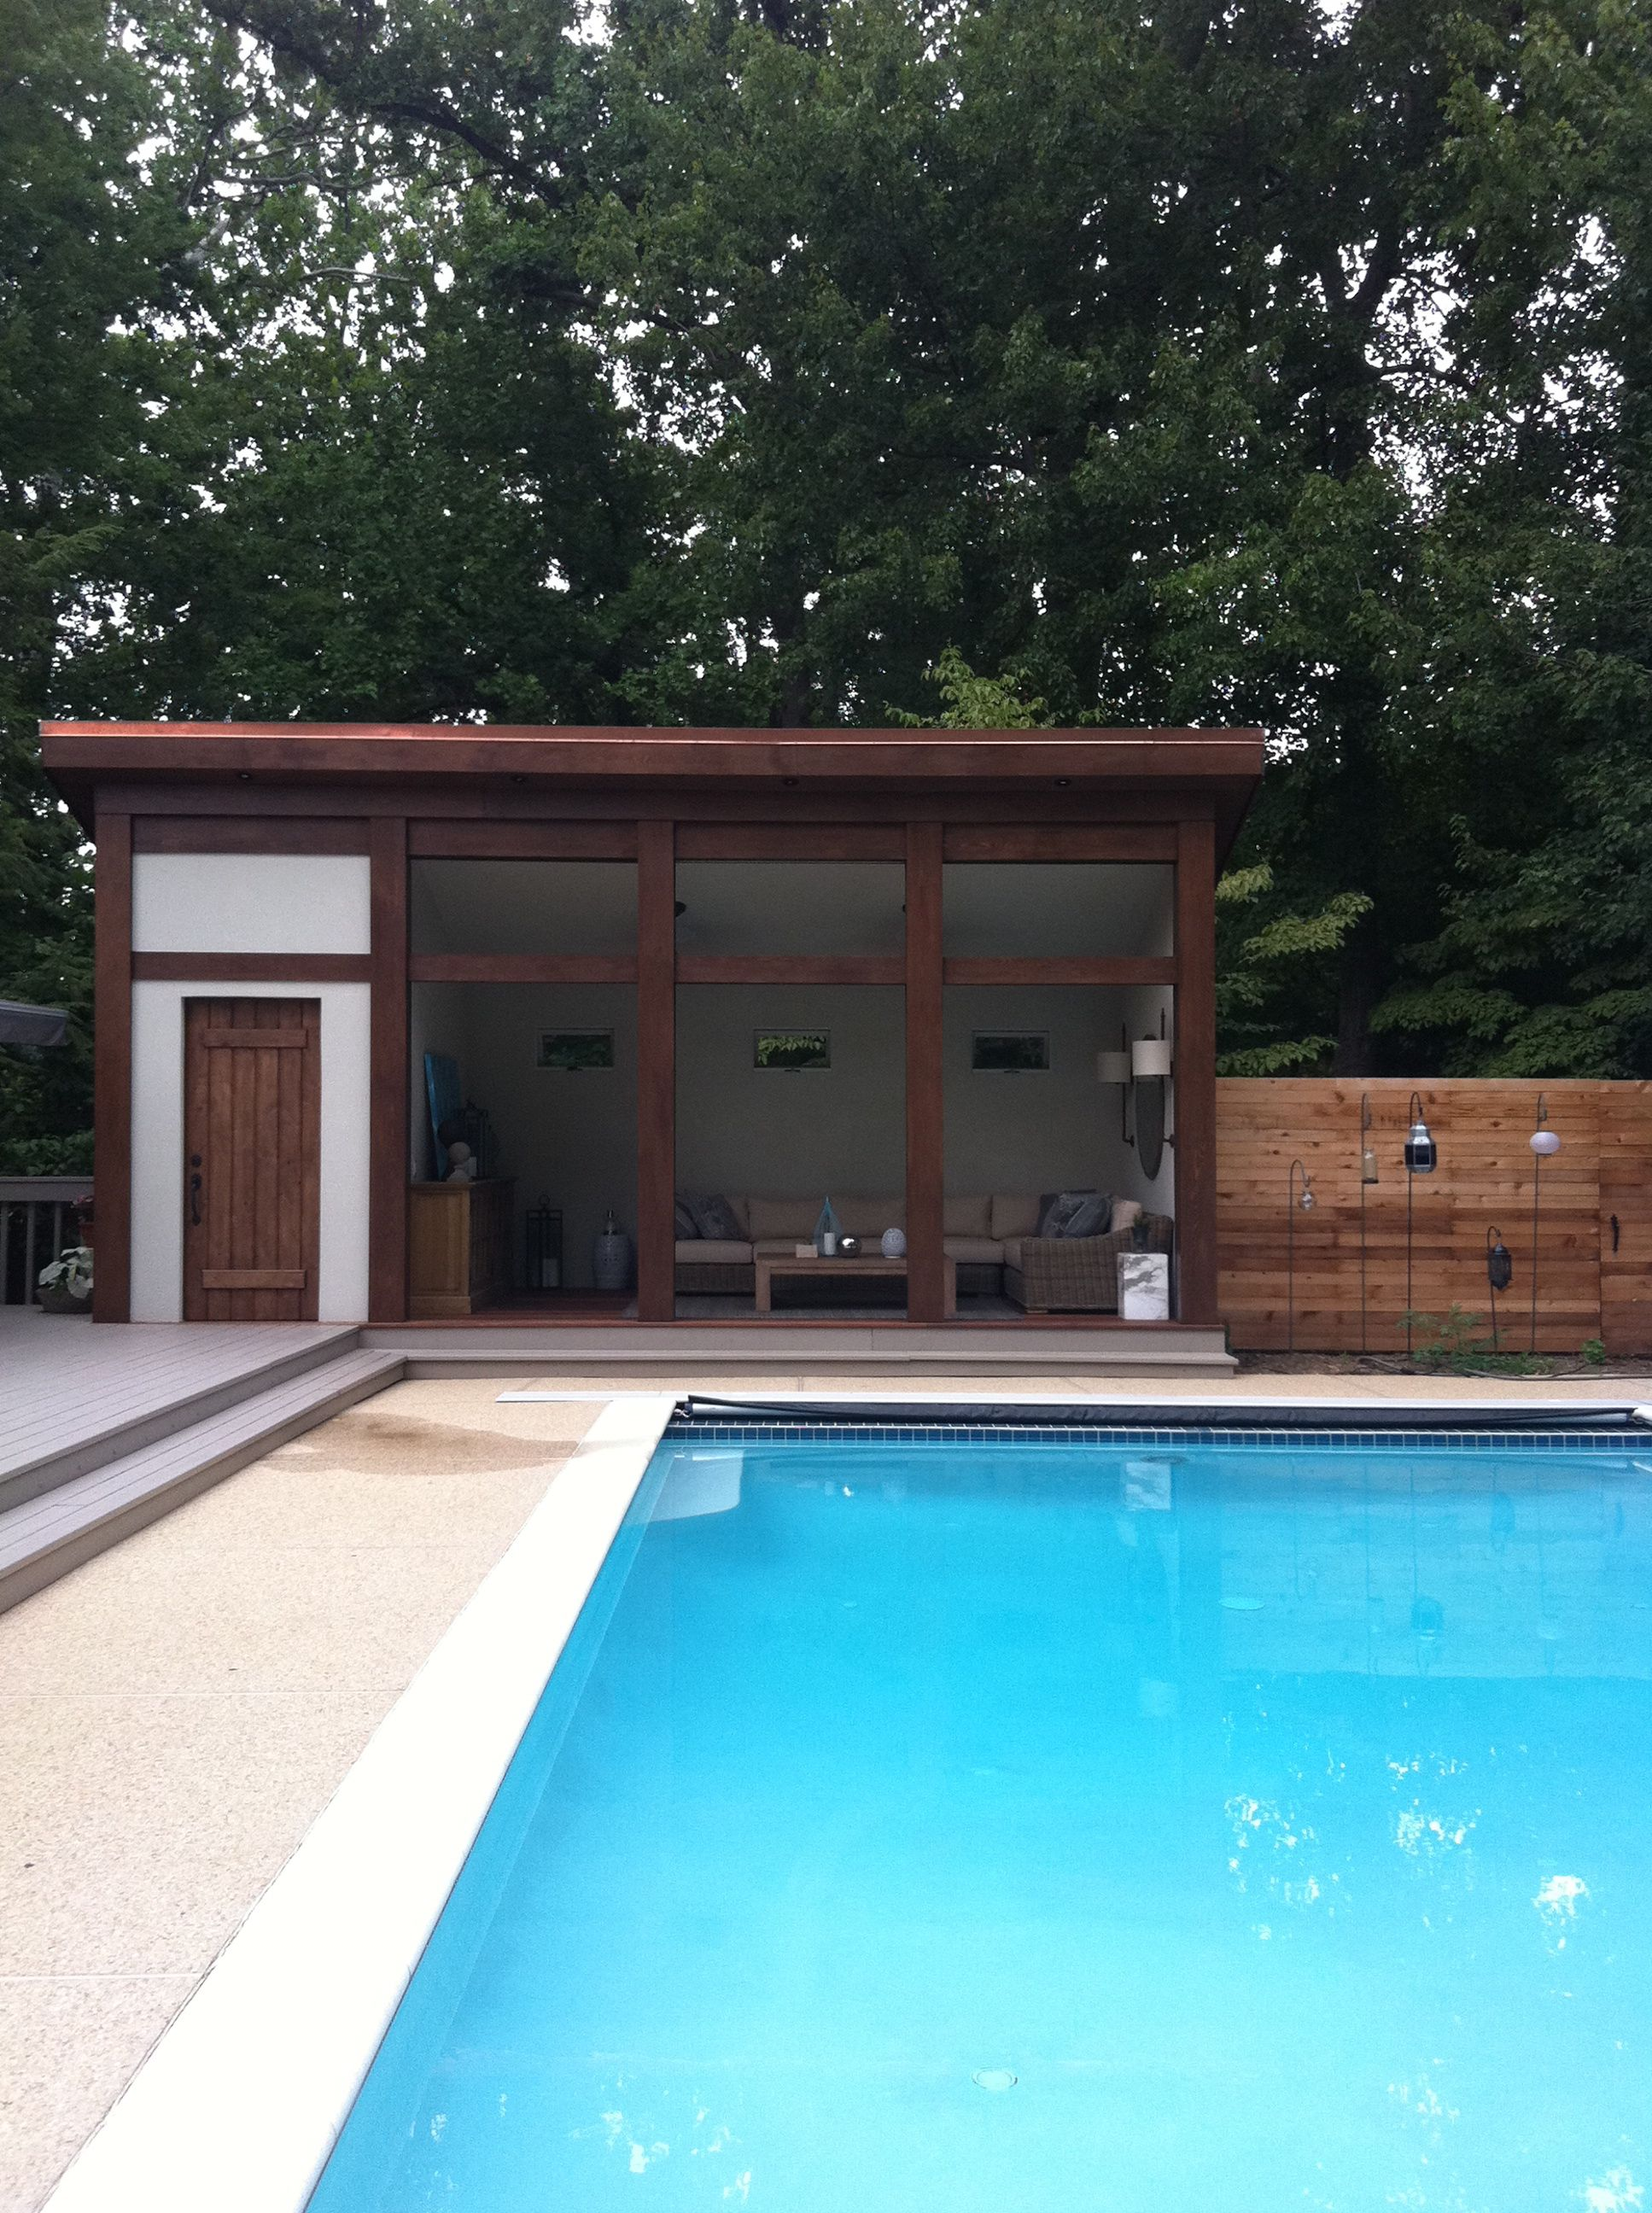 Pool Cabana Would Be Awesome Pool Houses Modern Pool